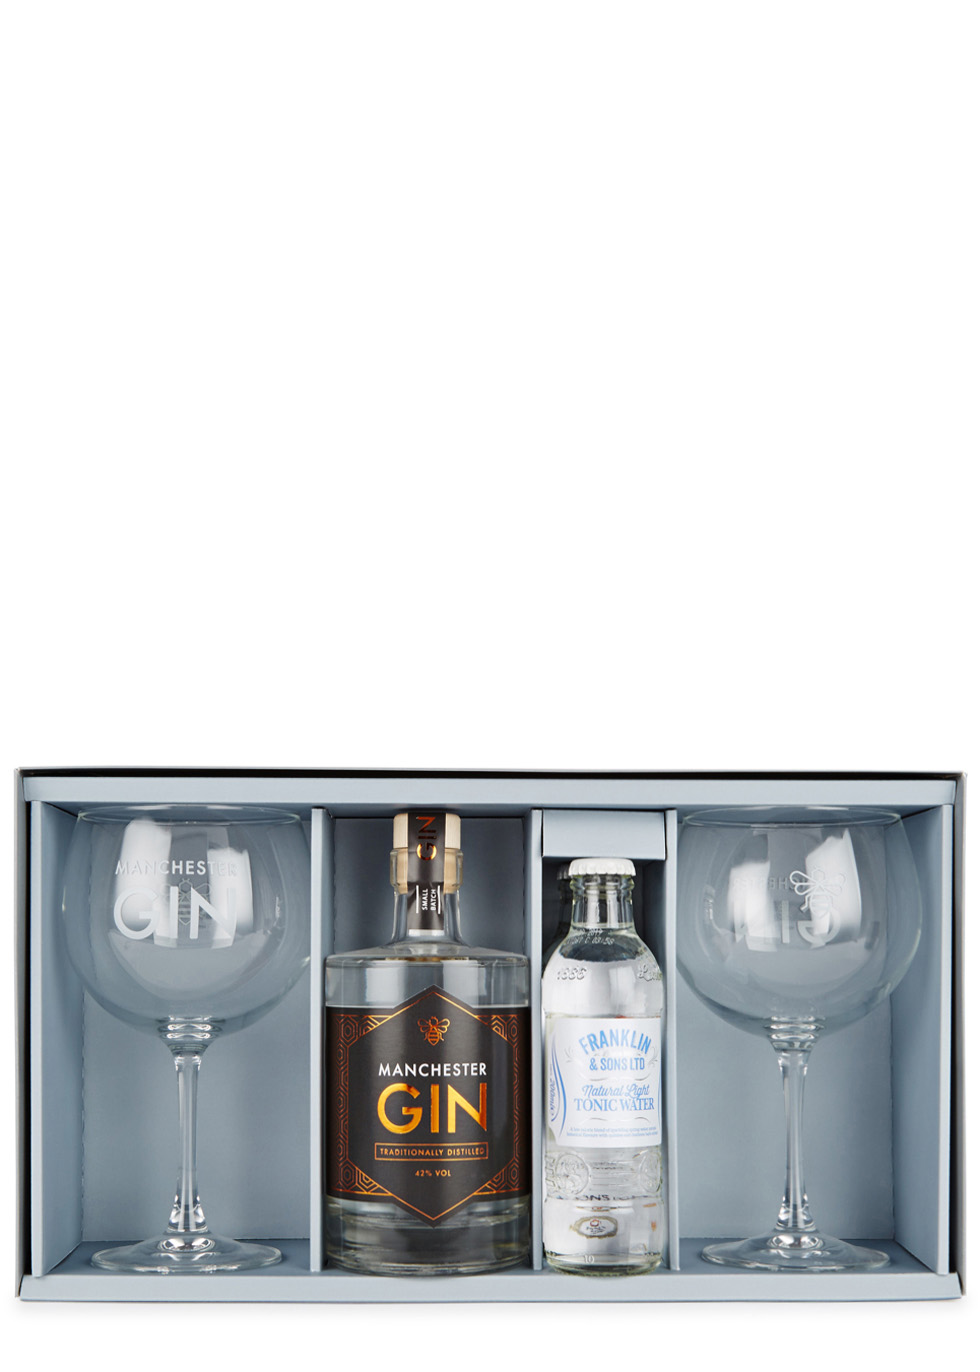 Manchester Gin u0026 Tonic Gift Set - Manchester Gin  sc 1 st  Harvey Nichols & Manchester Gin Manchester Gin u0026 Tonic Gift Set - Harvey Nichols